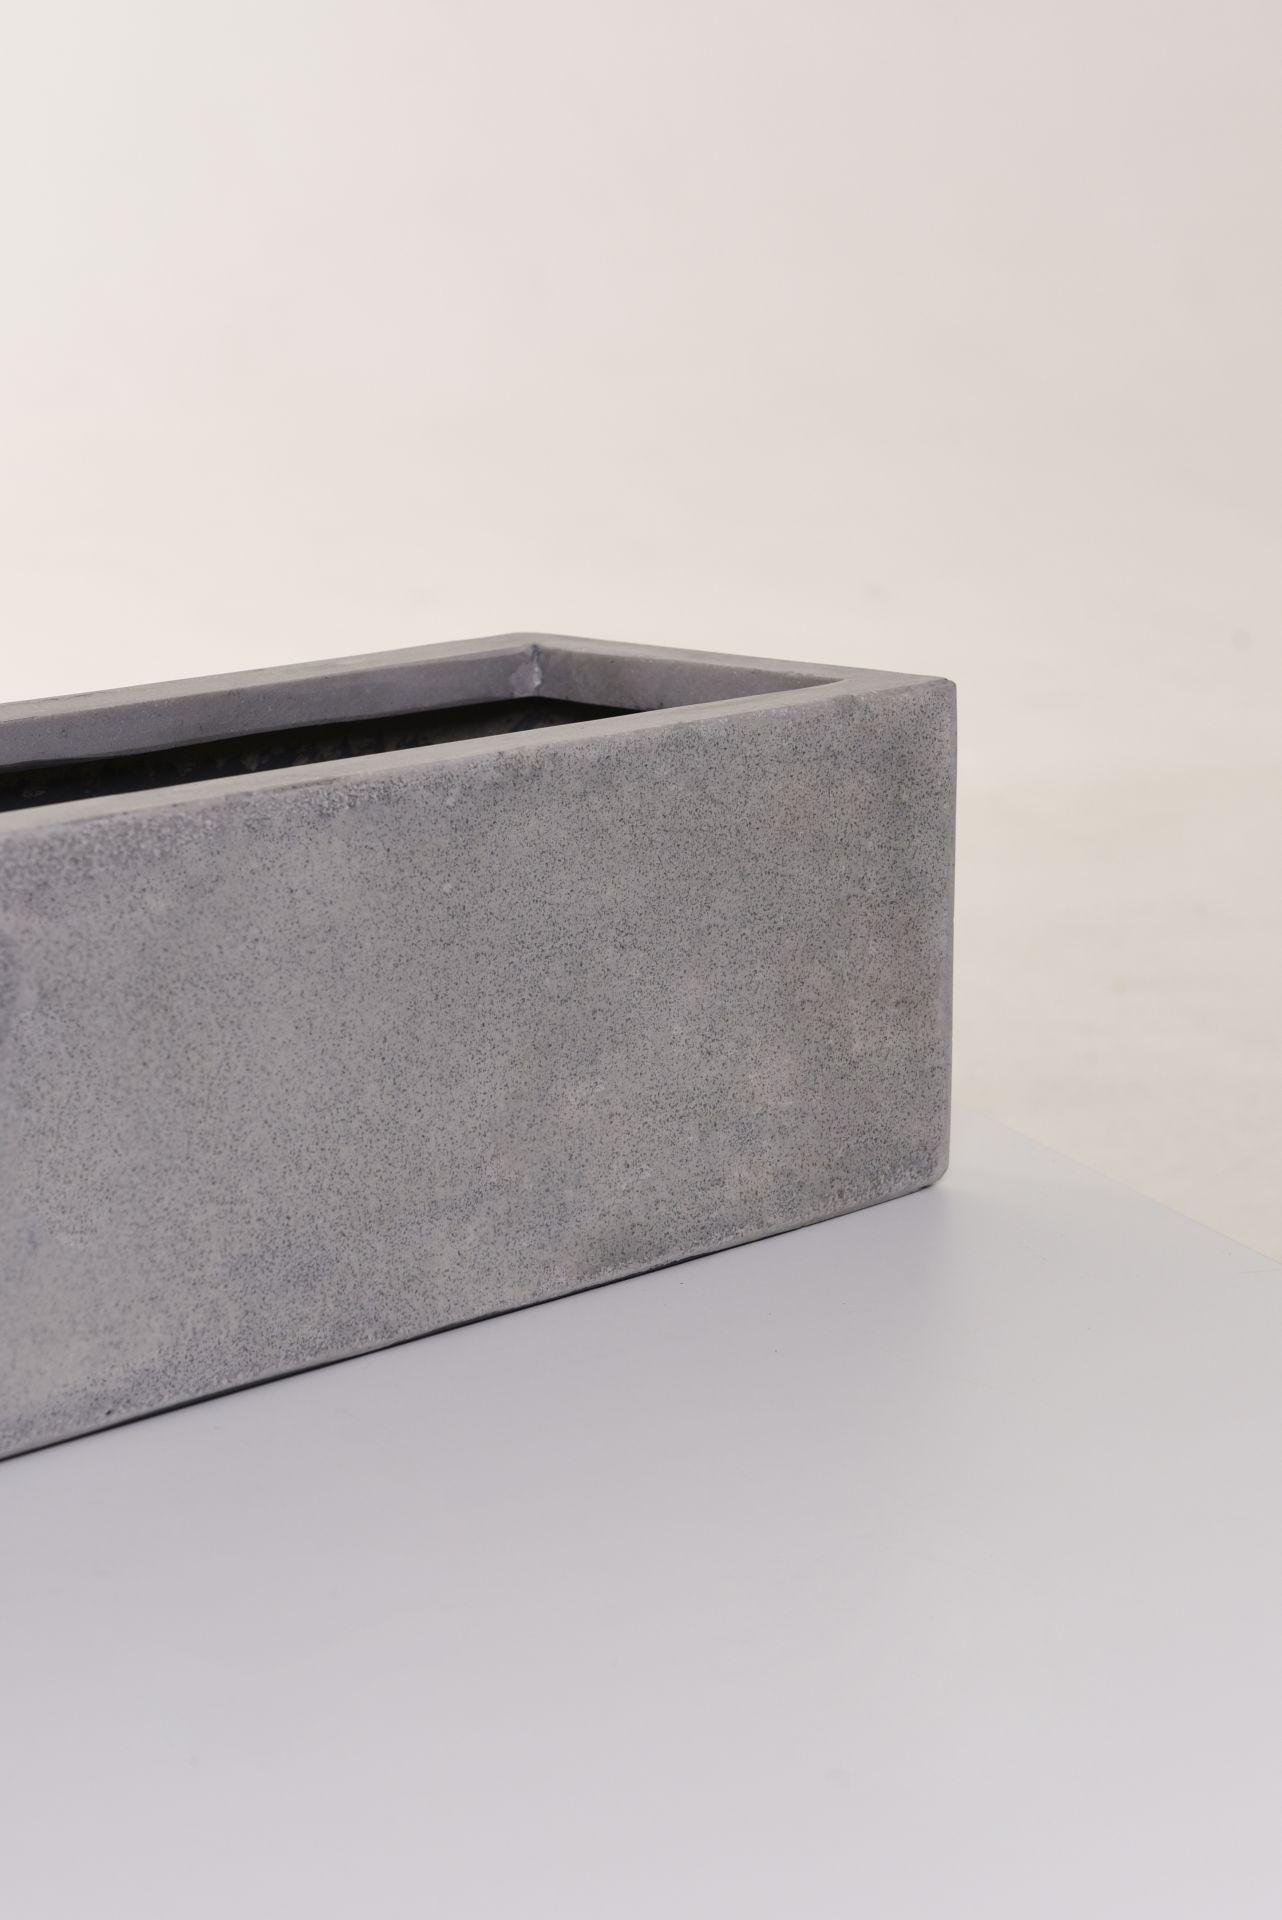 blumenkasten pflanzkasten fiberglas beton design flobo 100 cm grau ebay. Black Bedroom Furniture Sets. Home Design Ideas